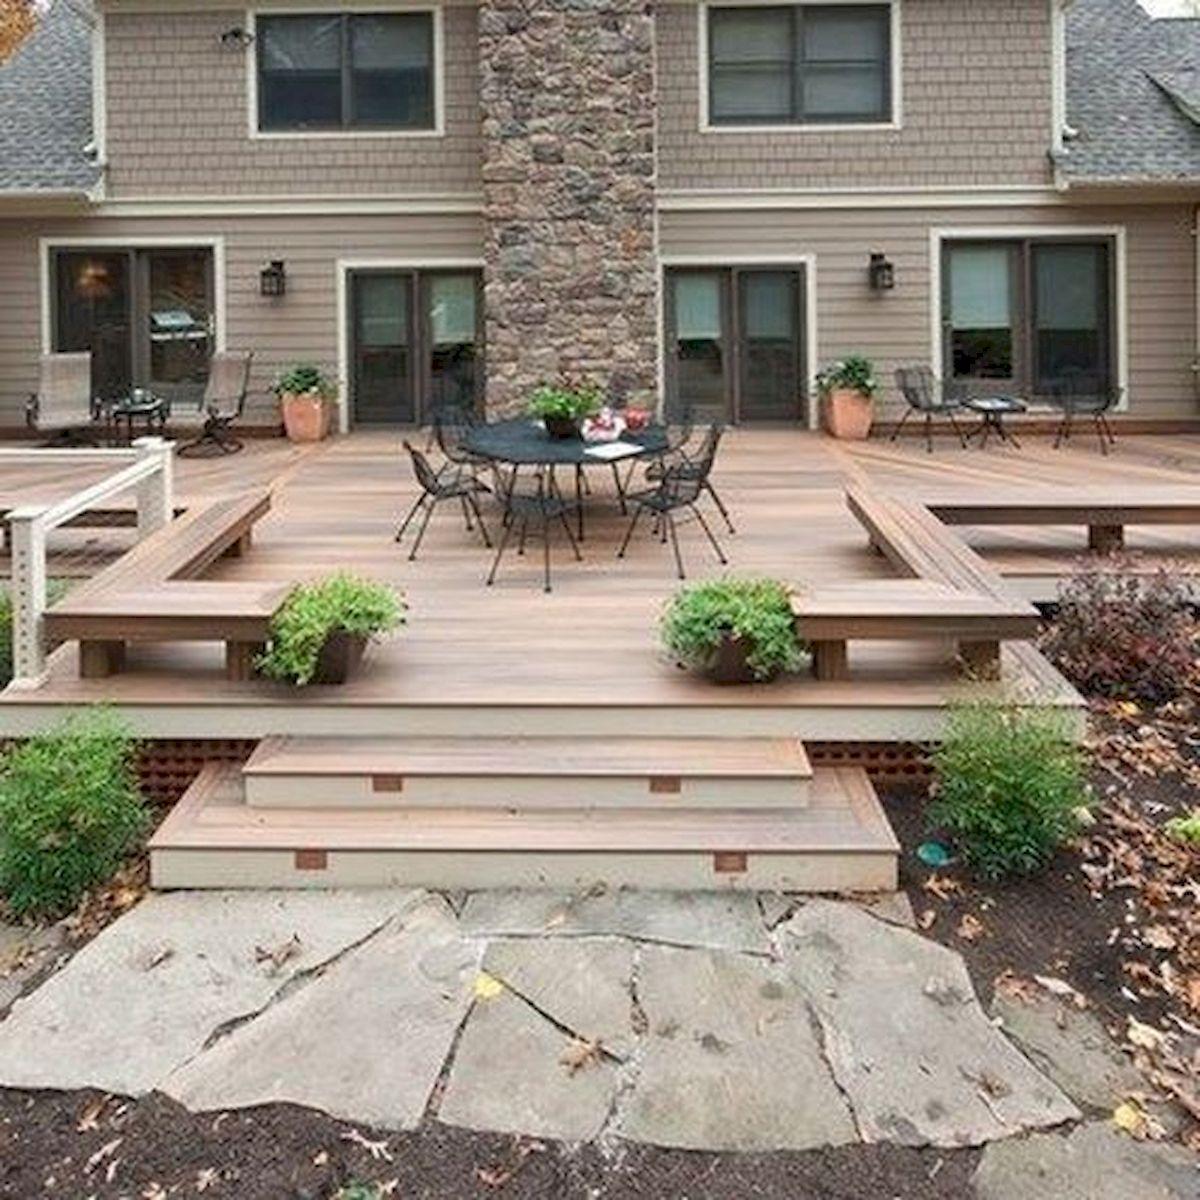 50 Fantastic Backyard Patio and Decking Design Ideas (38)